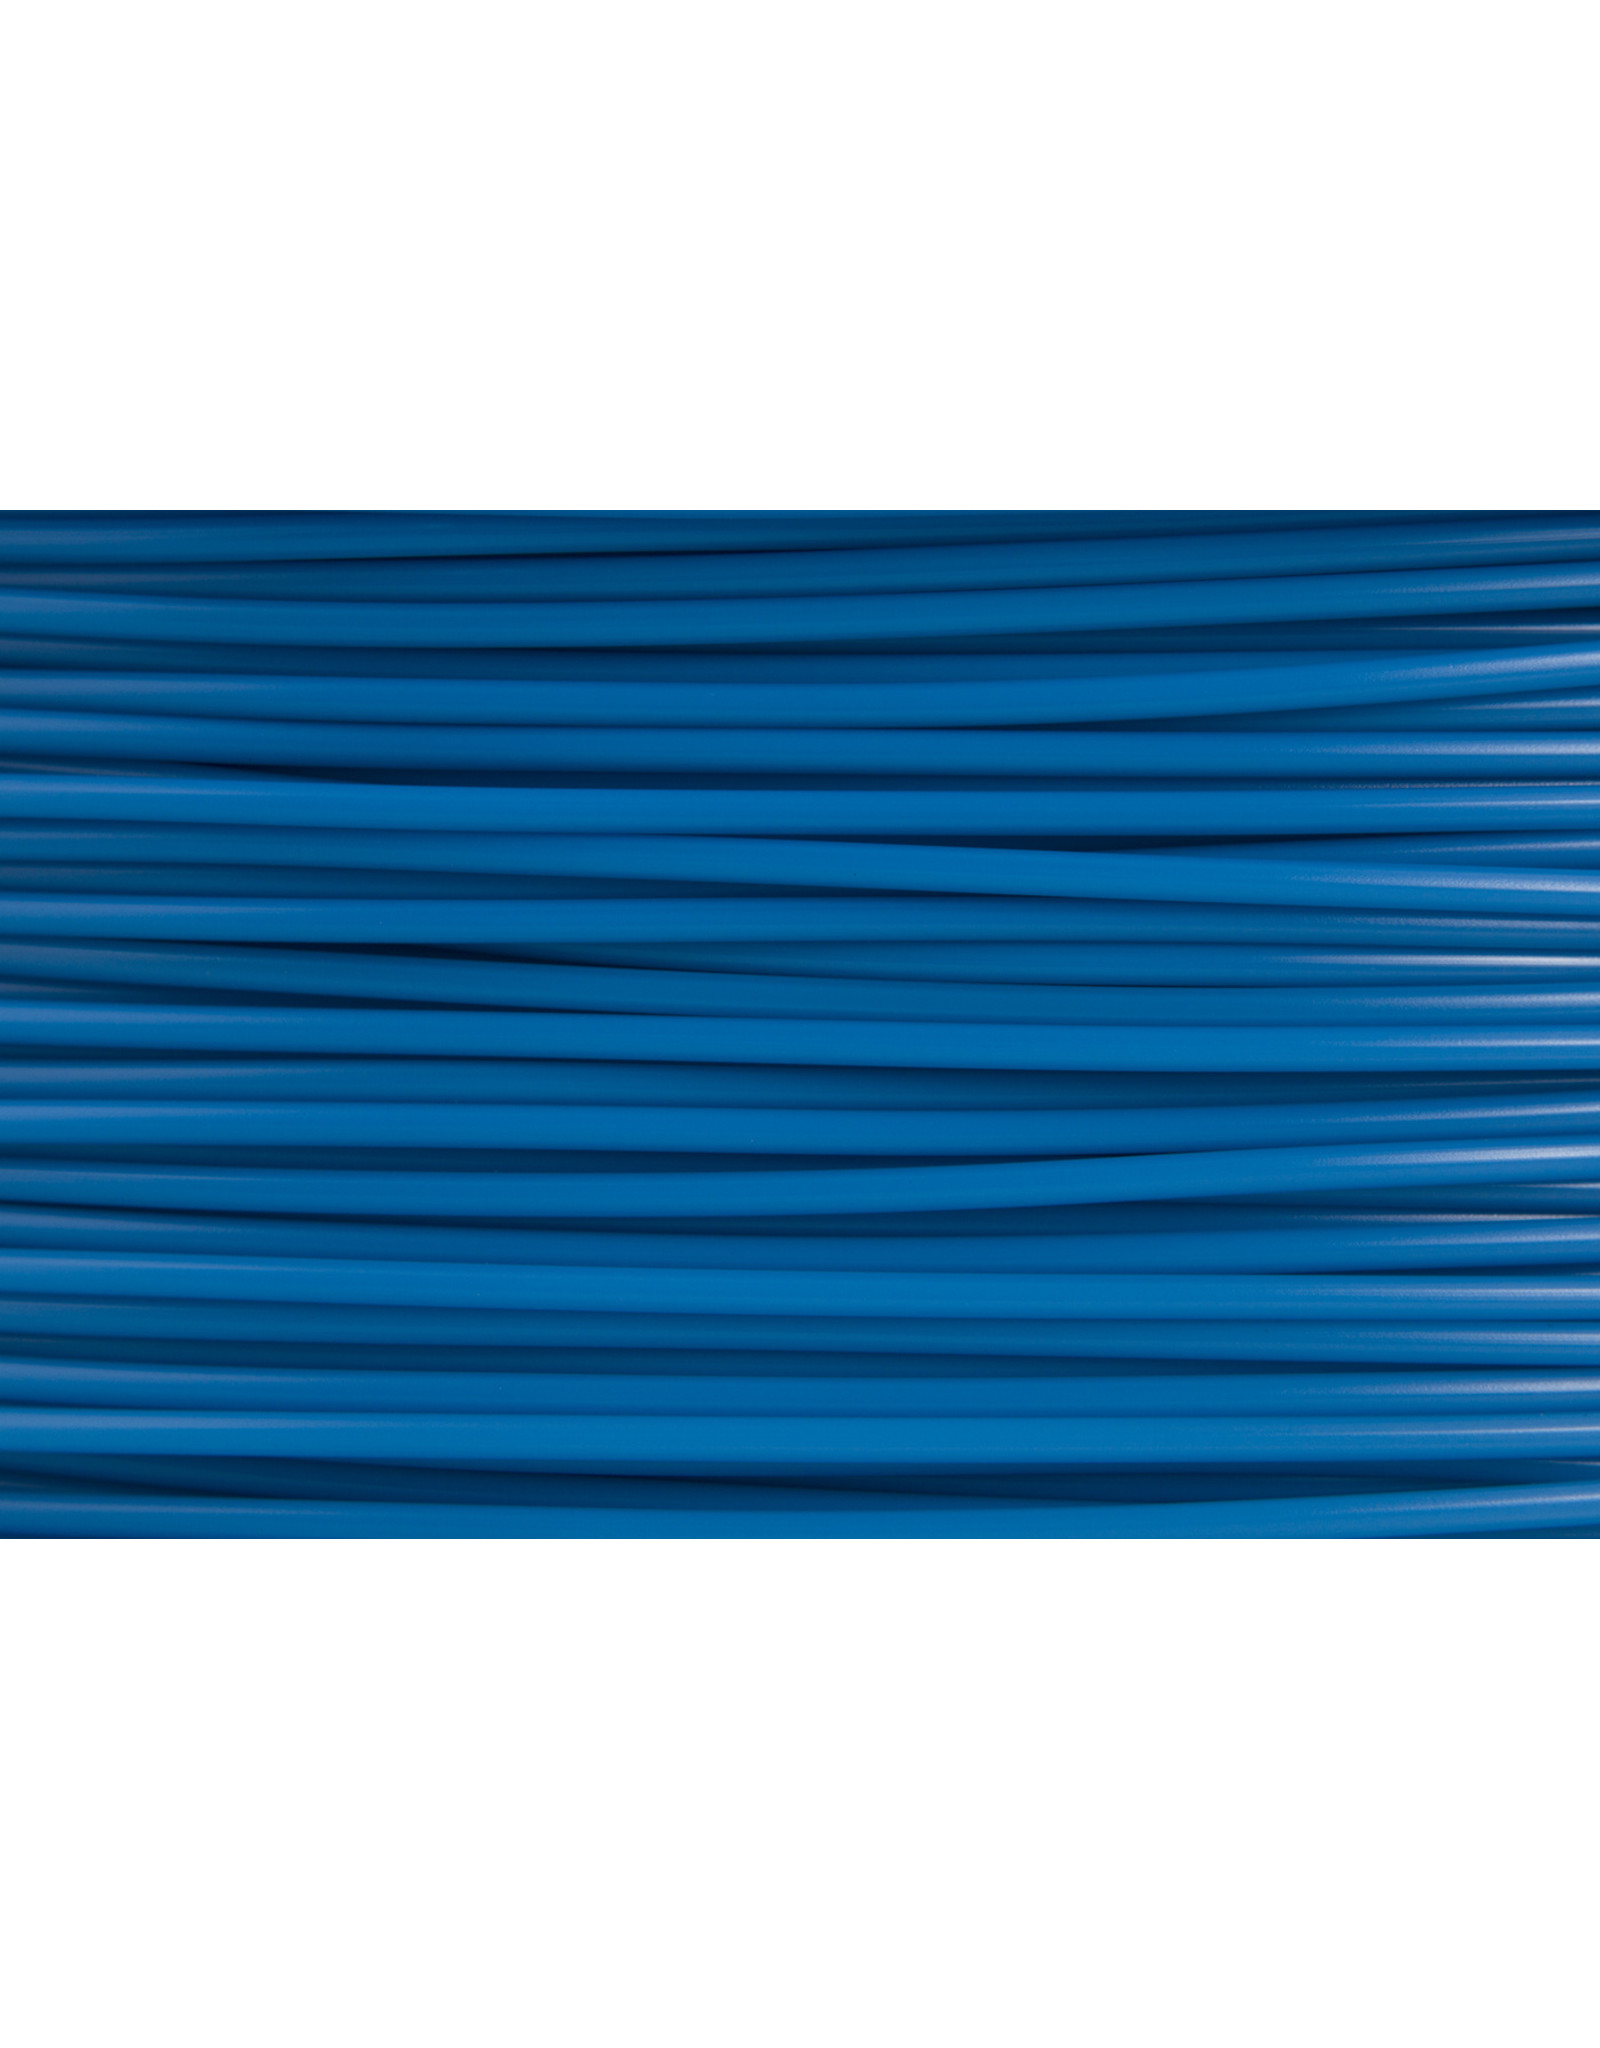 Prima PrimaSelect PLA 1.75mm - 750gr Light blue